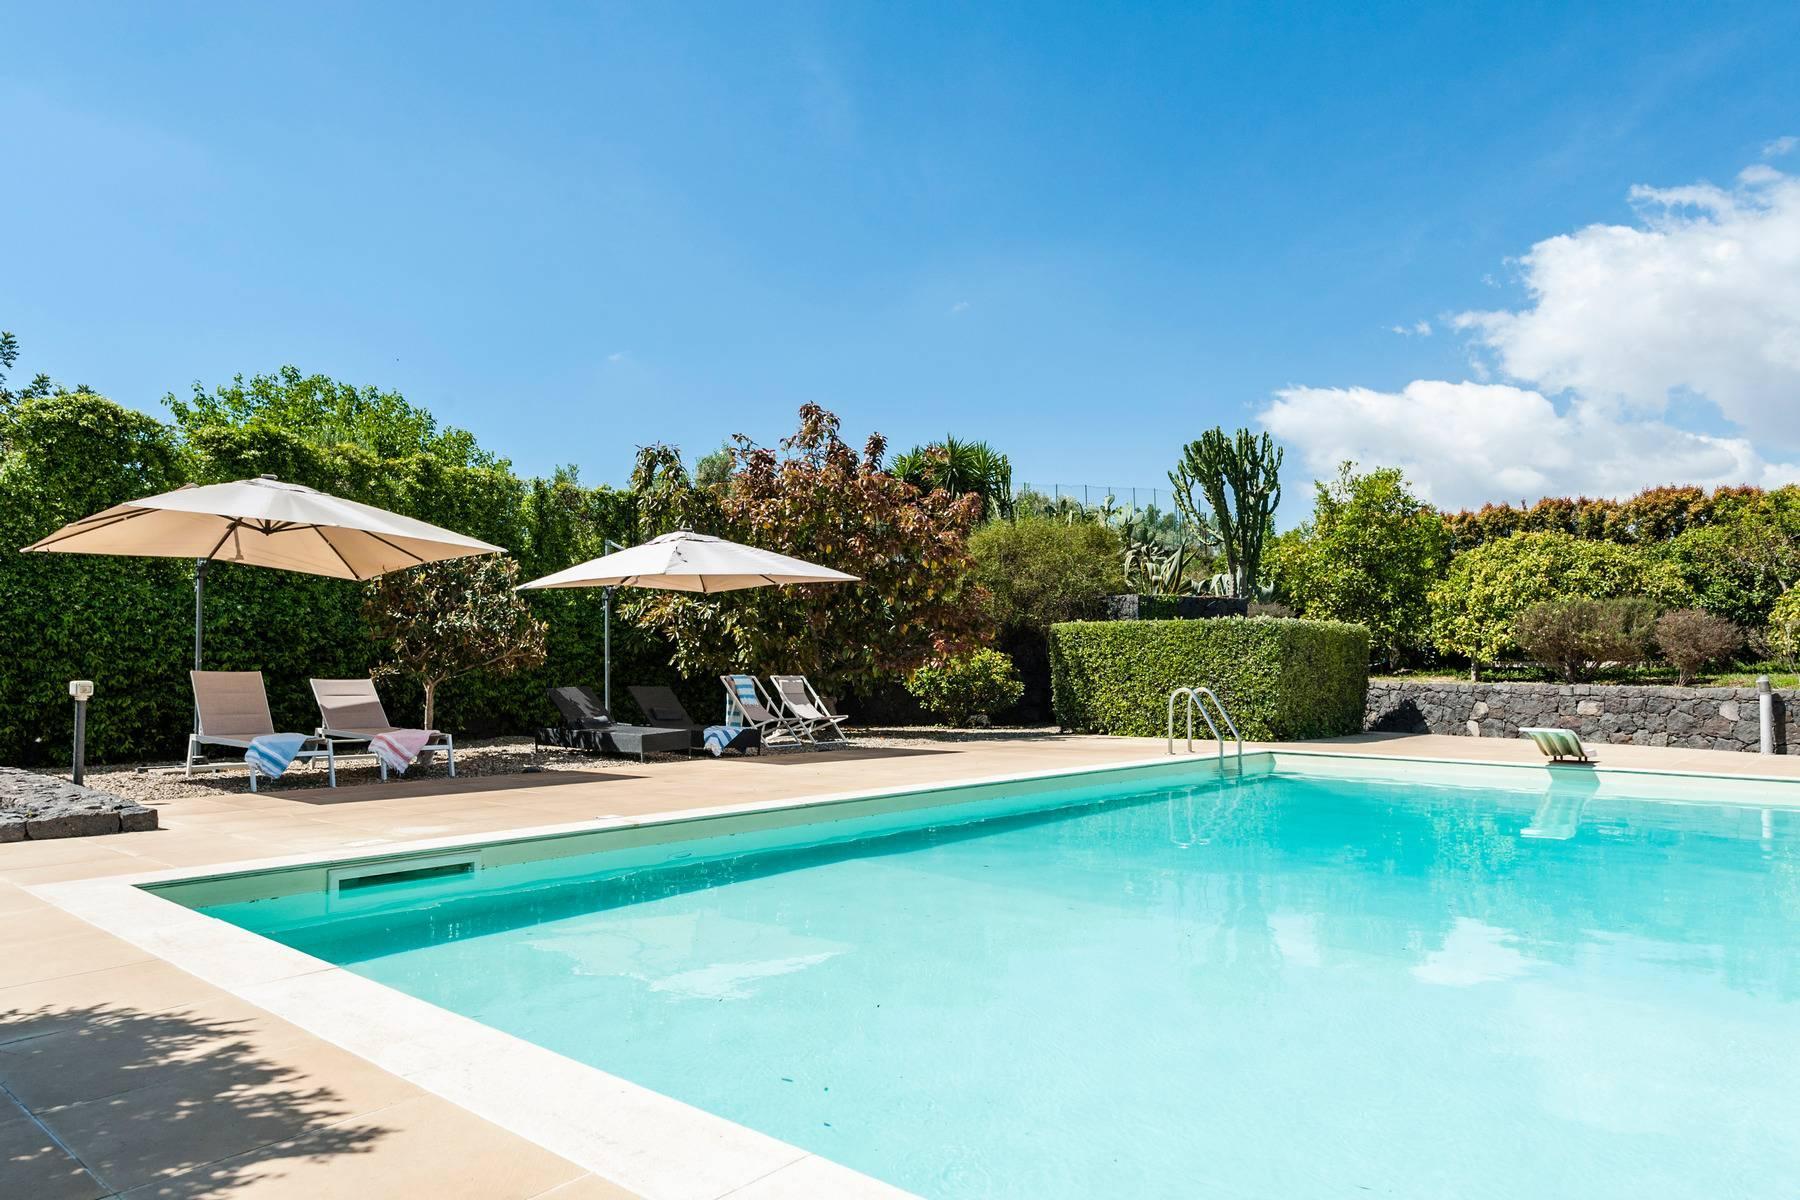 Villa esclusiva con piscina con vista ad Acireale - 6